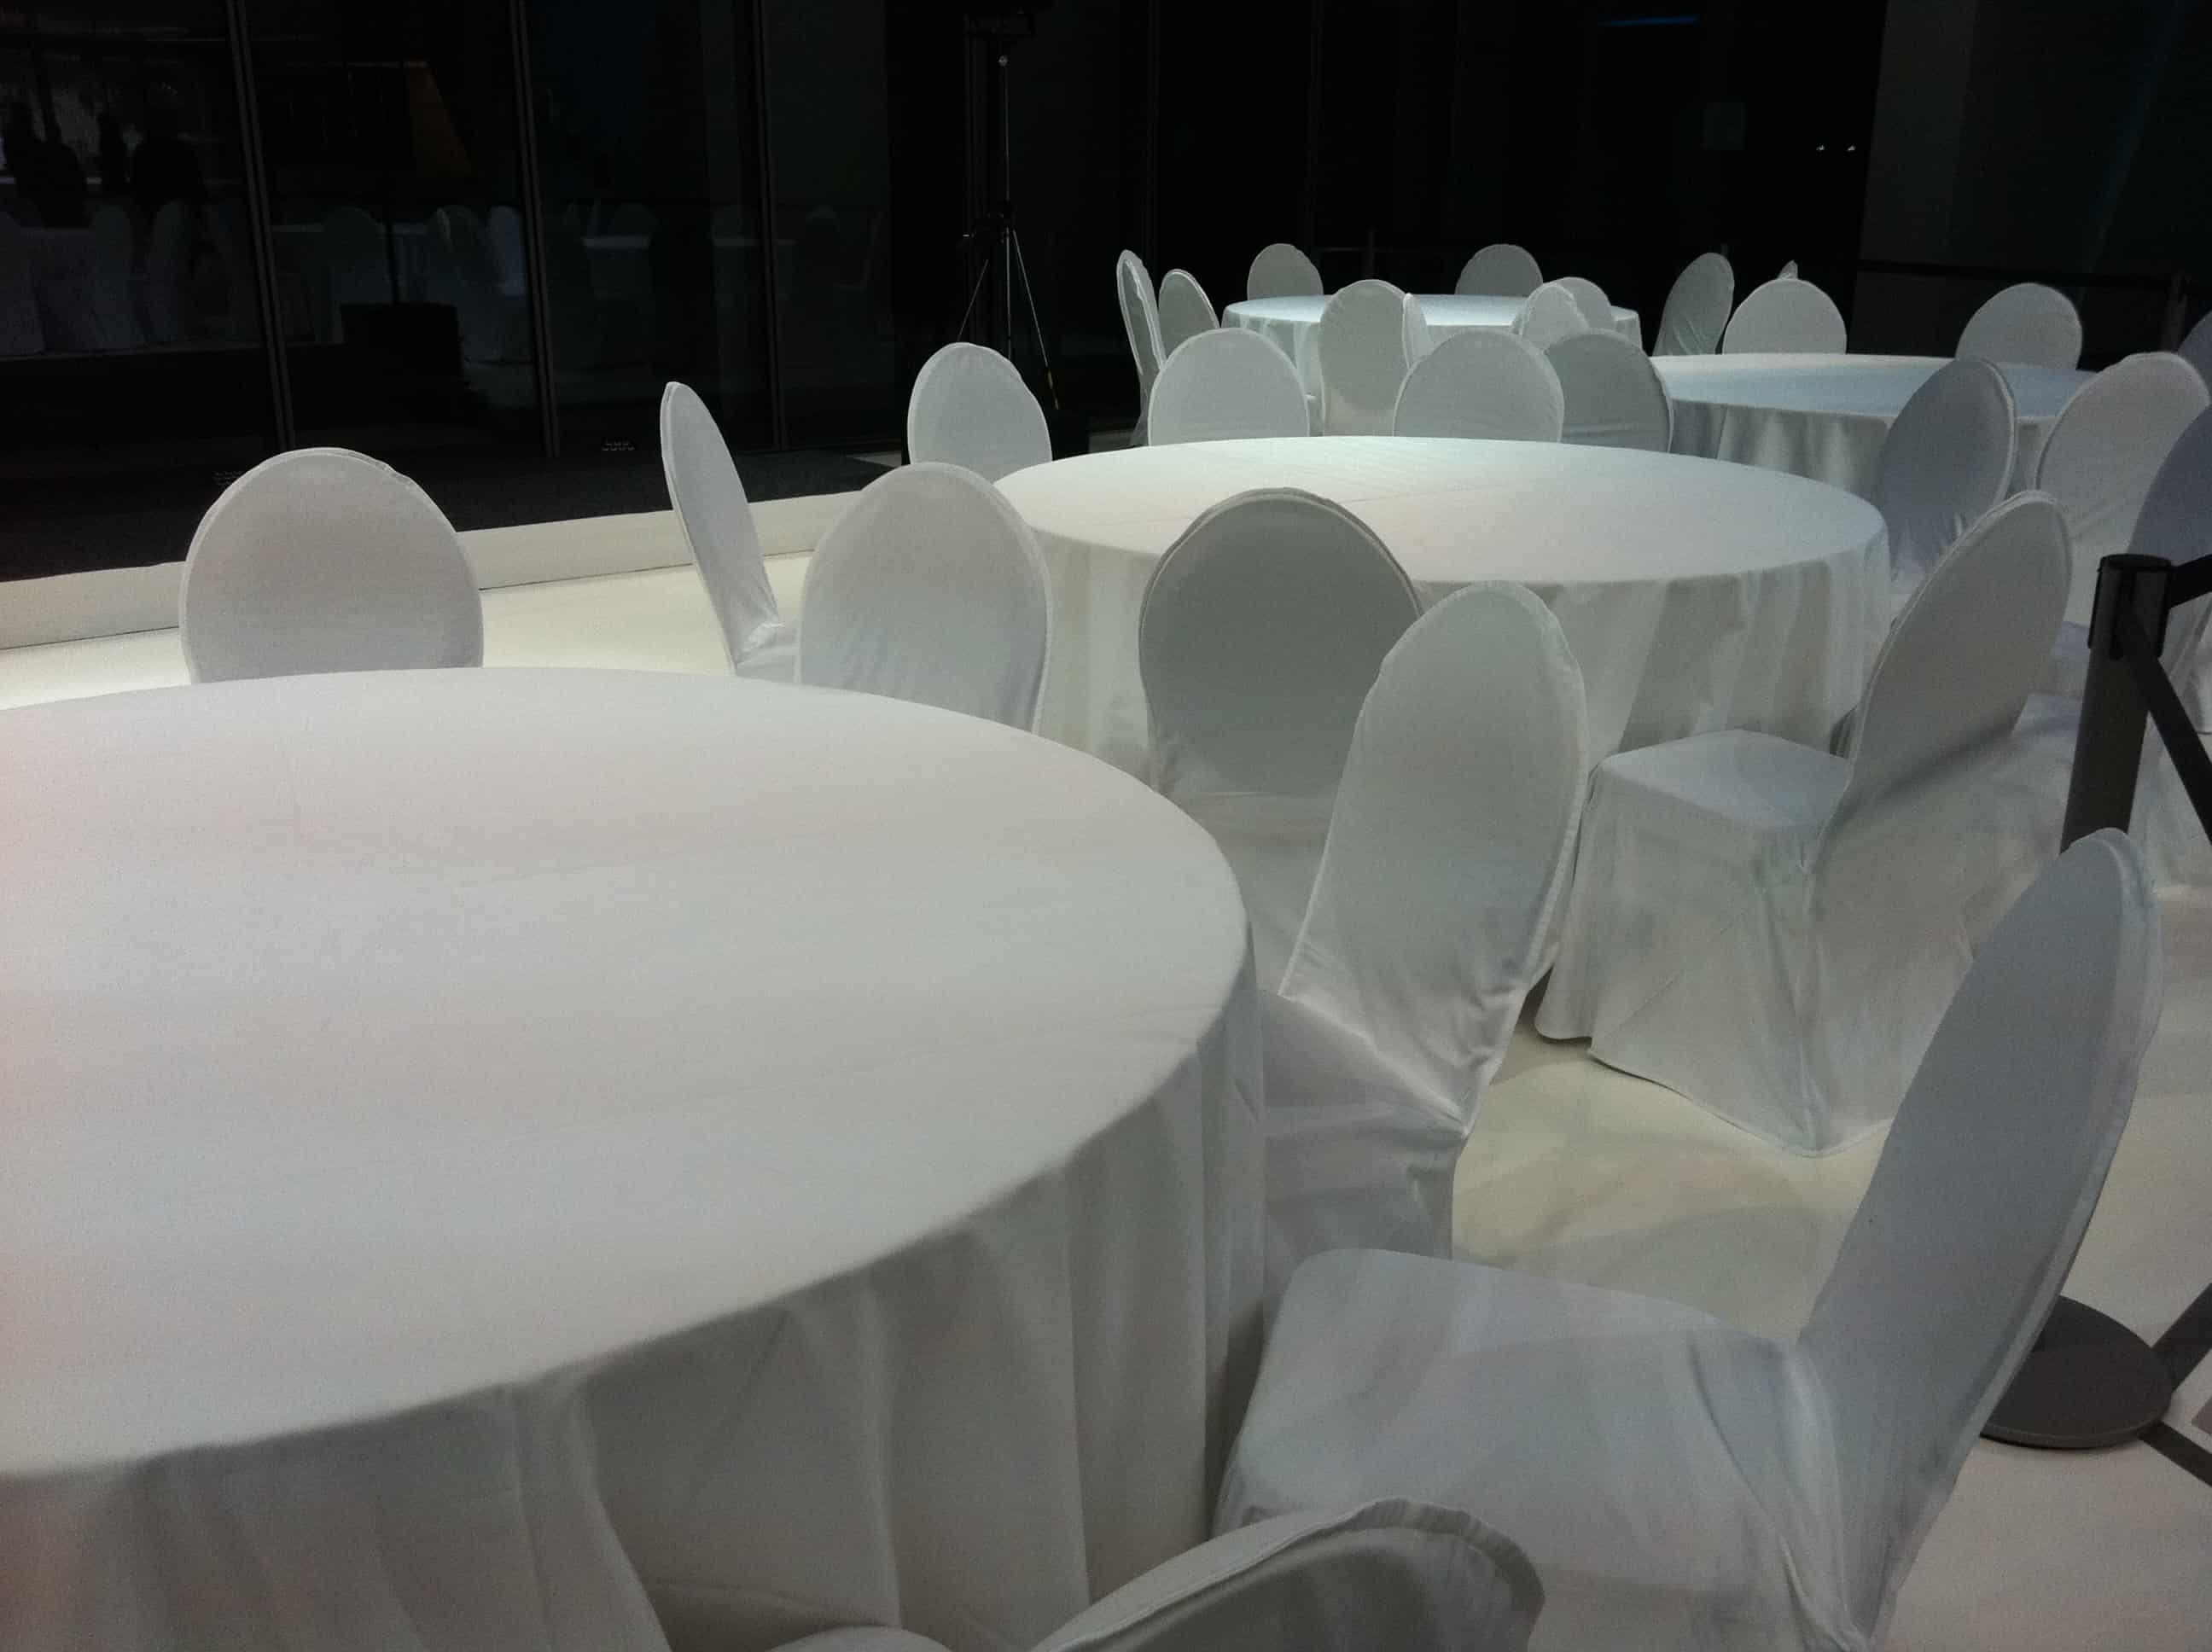 Verhuur Feestmateriaal Prieeltjes Partytafels Ronde Tafels